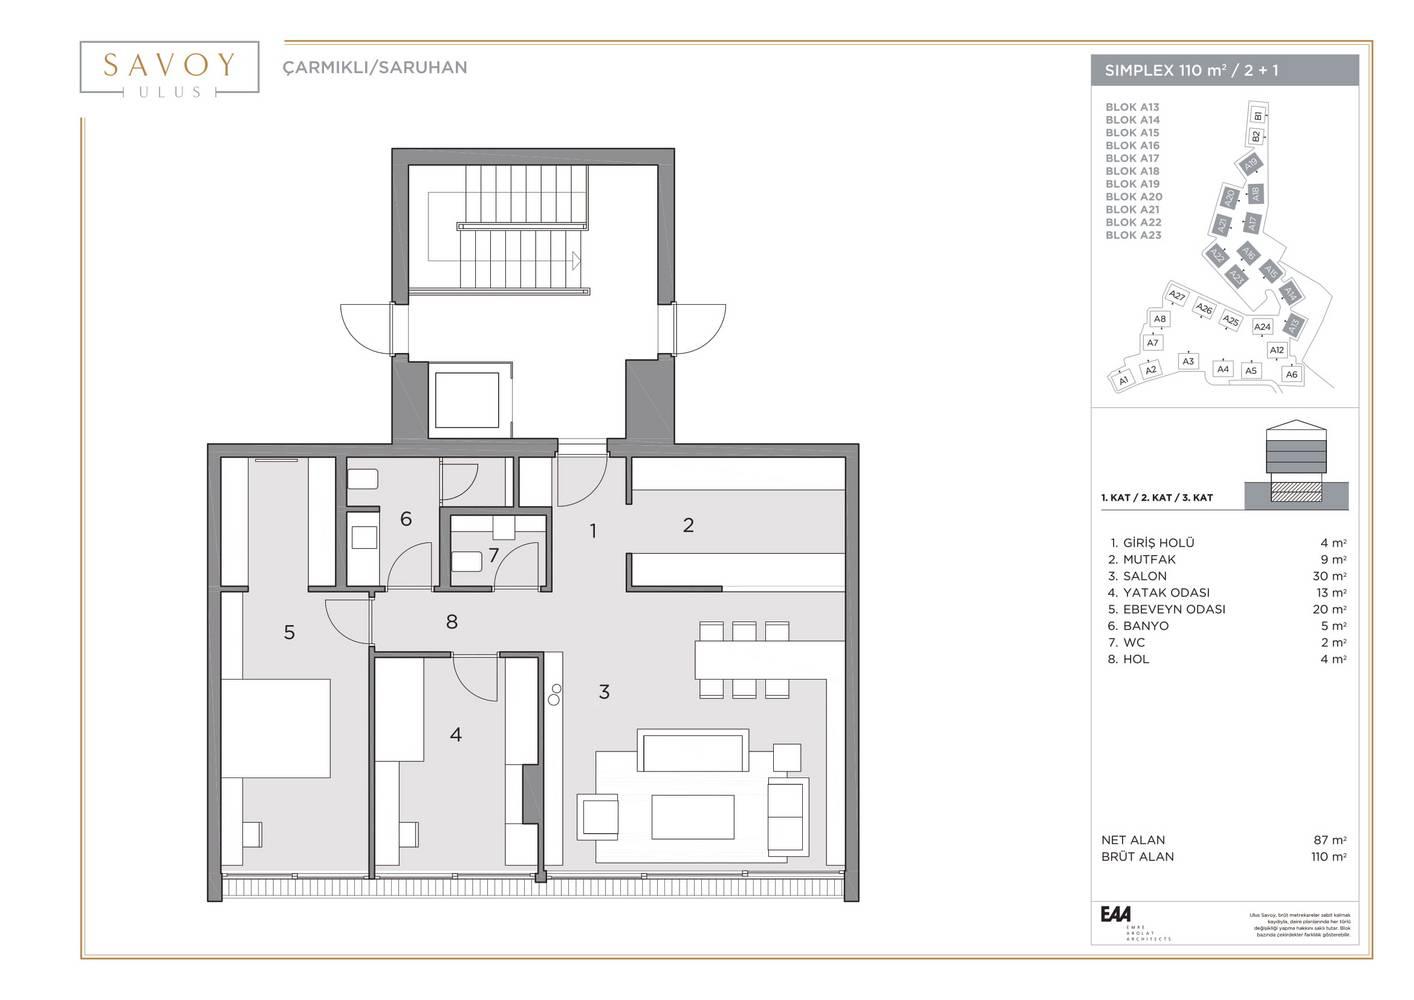 Savoy Residence S110